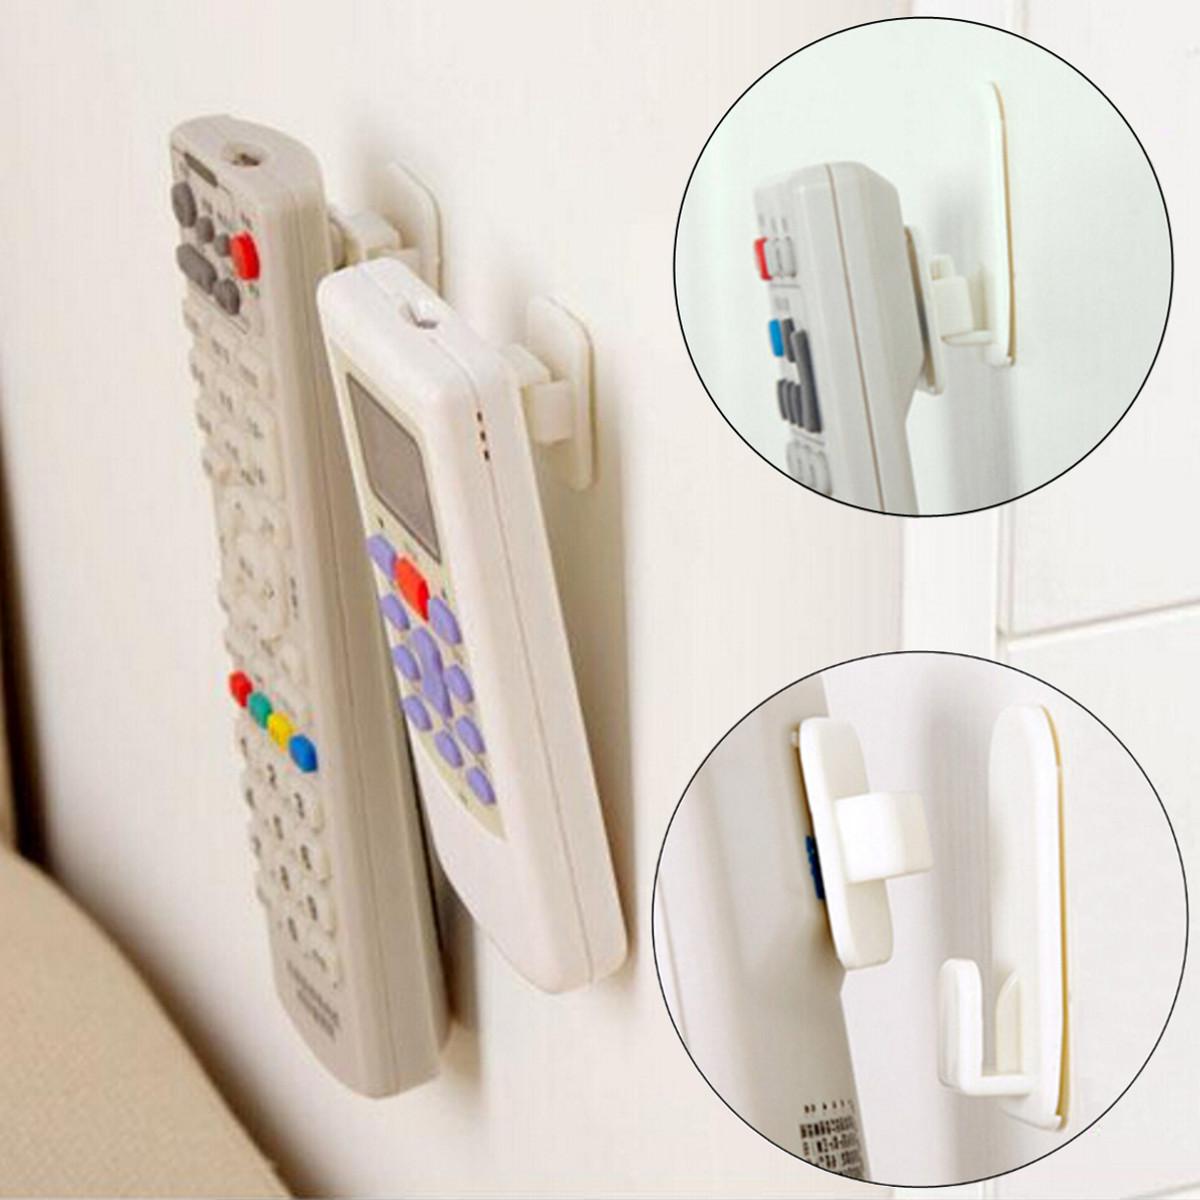 New 2Set(4Pcs) Self Adhesive Plastic Hooks Holder Remote Control Sticky Hook Hanger TV Air Conditioner Key Wall Storage(China (Mainland))